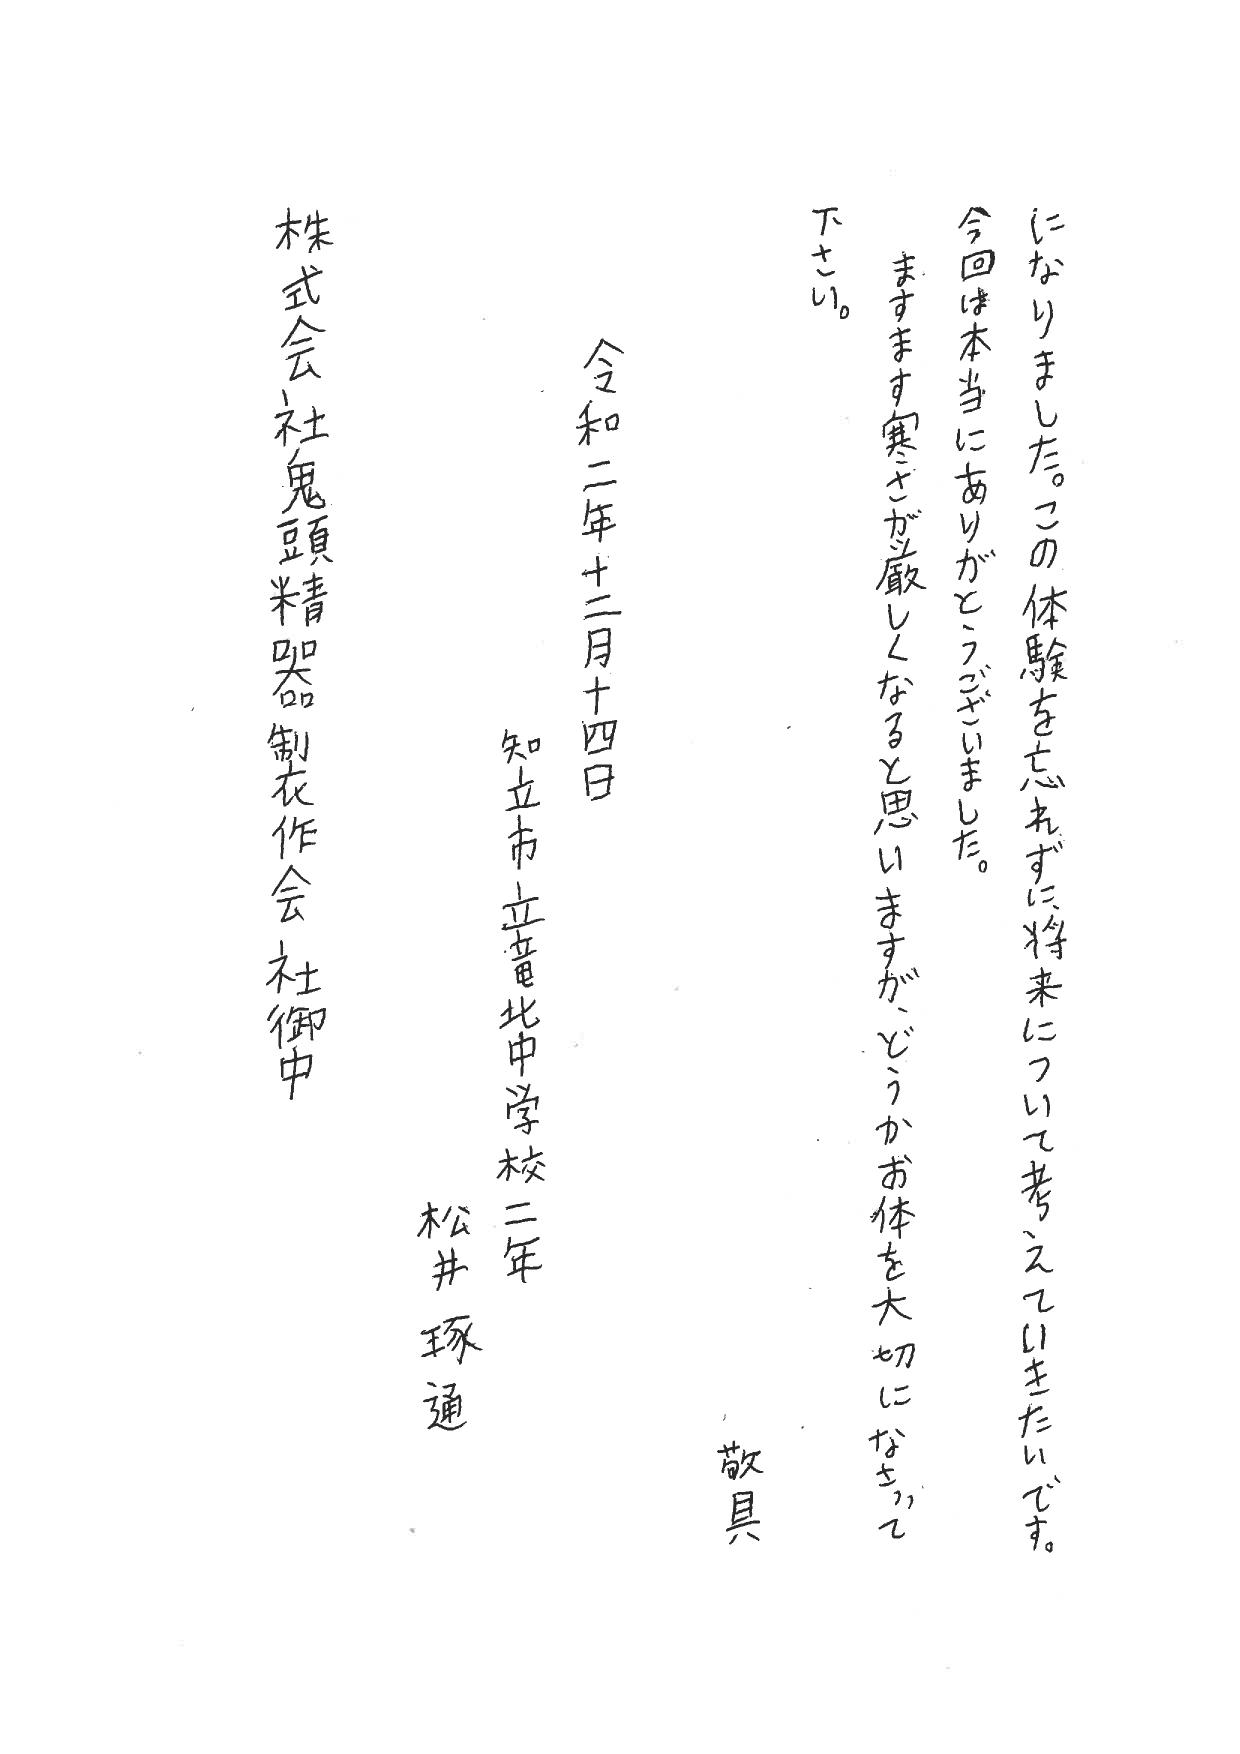 20201216竜北中学校の職場体験活動お礼状-2_page-0006.jpg